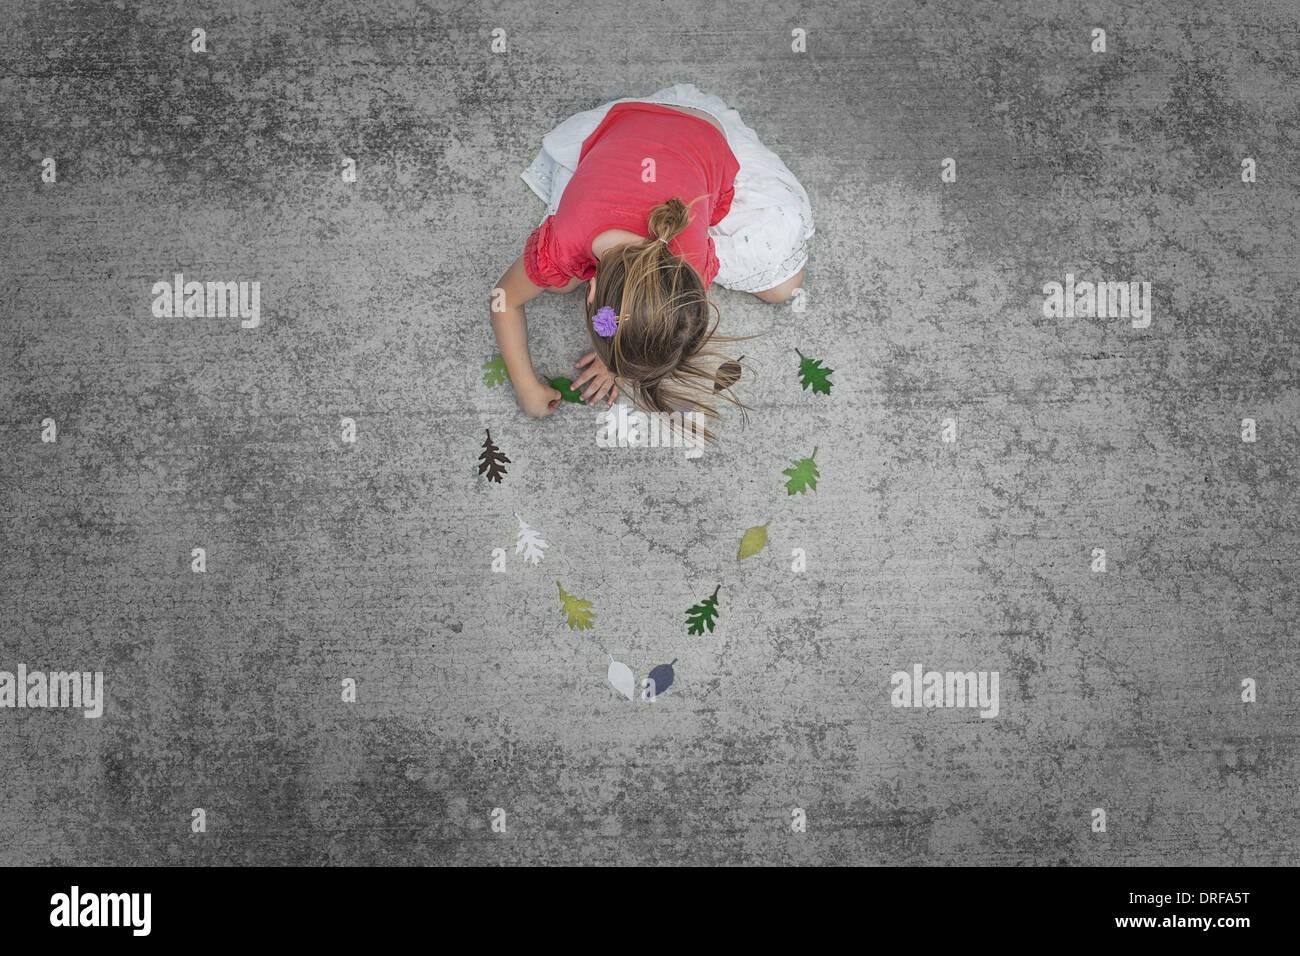 Utah USA Kind zu Fuß entlang der farbigen Blattformen Stockbild